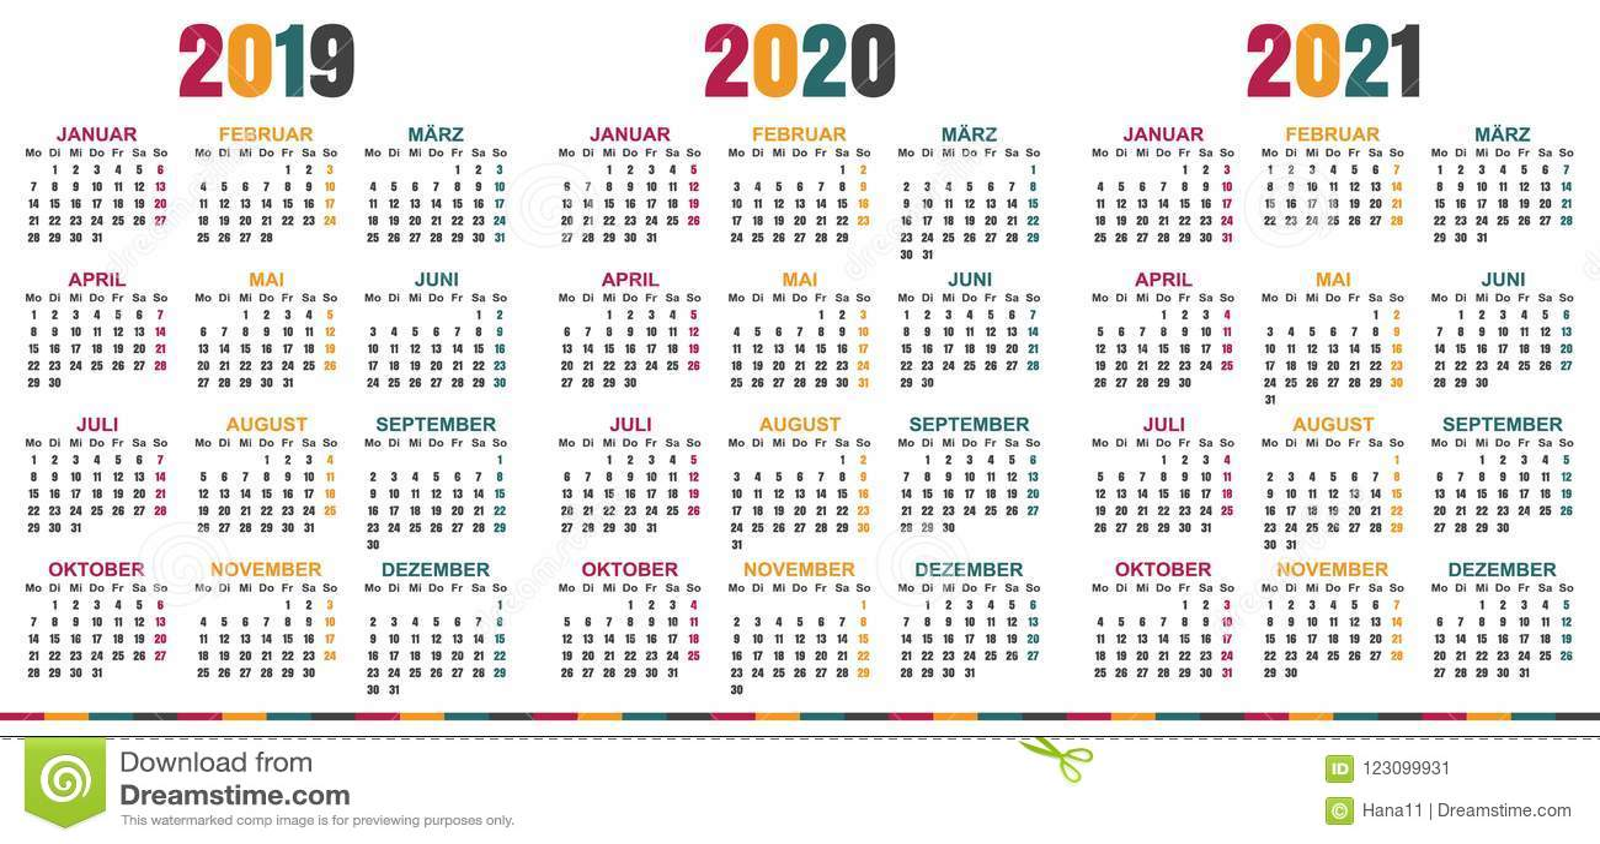 Calendario Tedesco 2019 2021 Illustrazione Vettoriale